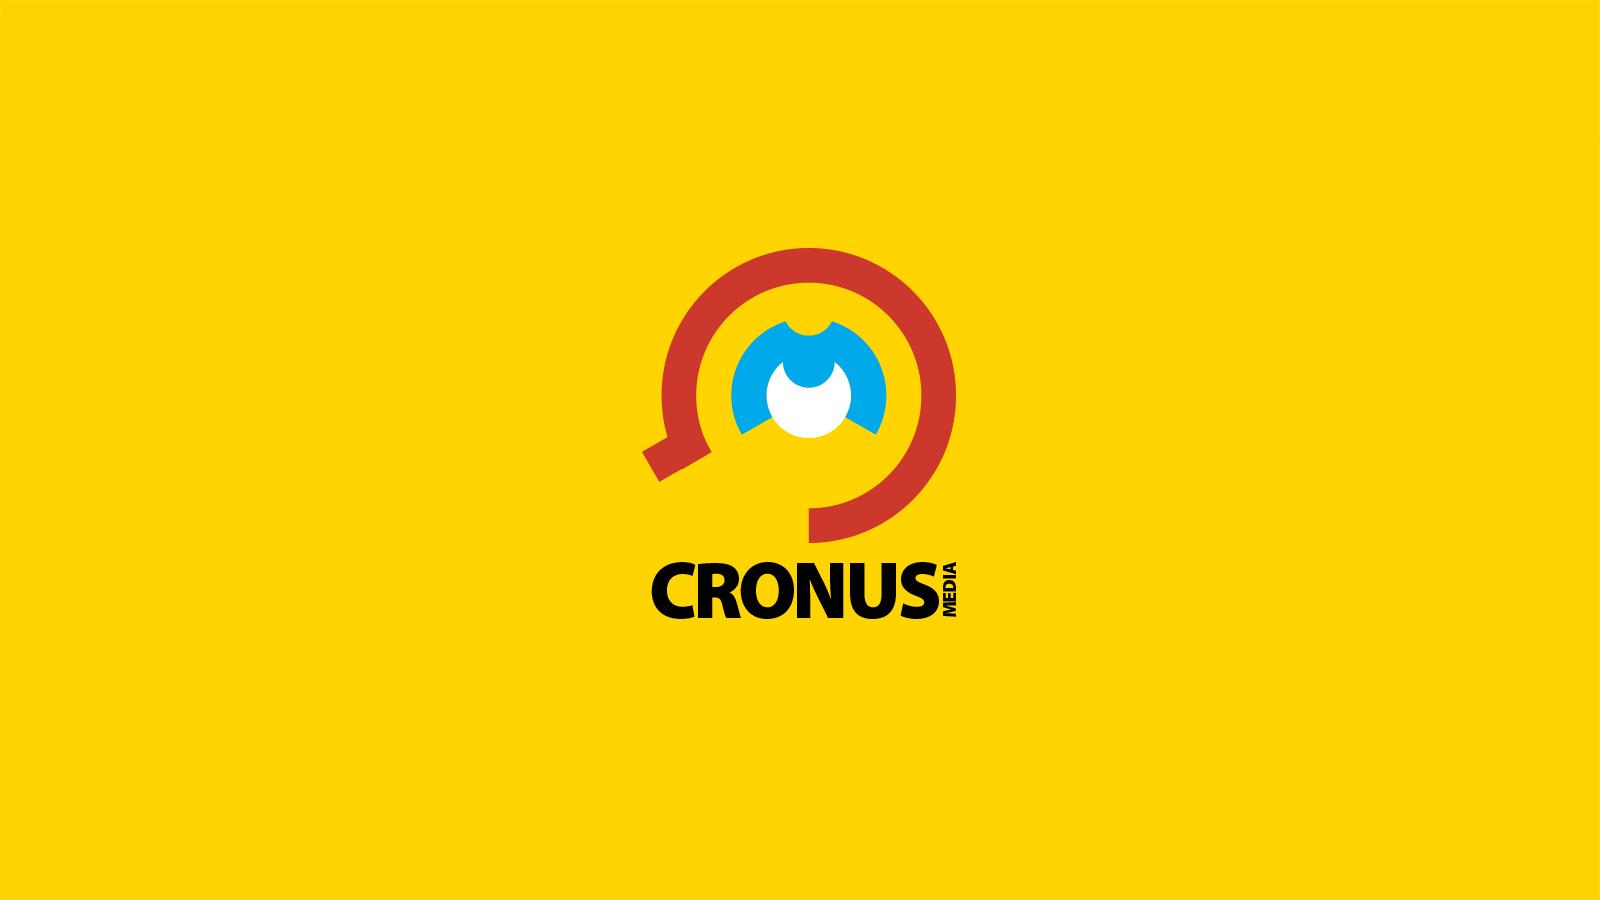 Branding logo design start up מיתוג ועיצוב לוגו לסטארט אפ Cronus Media